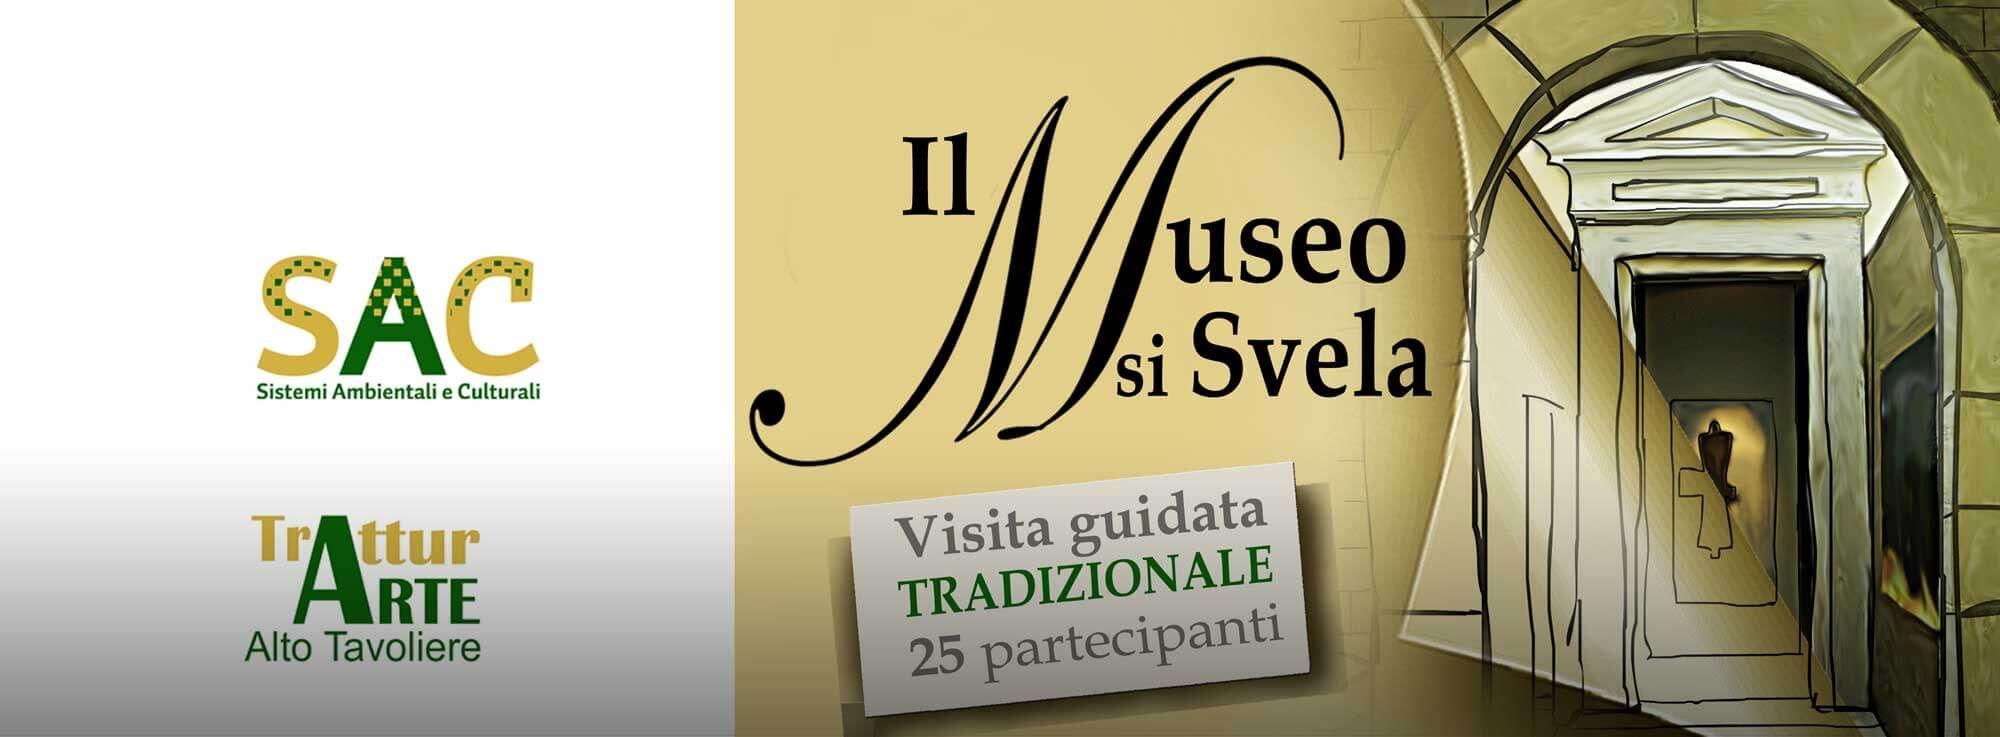 Apricena: Il Museo si svela